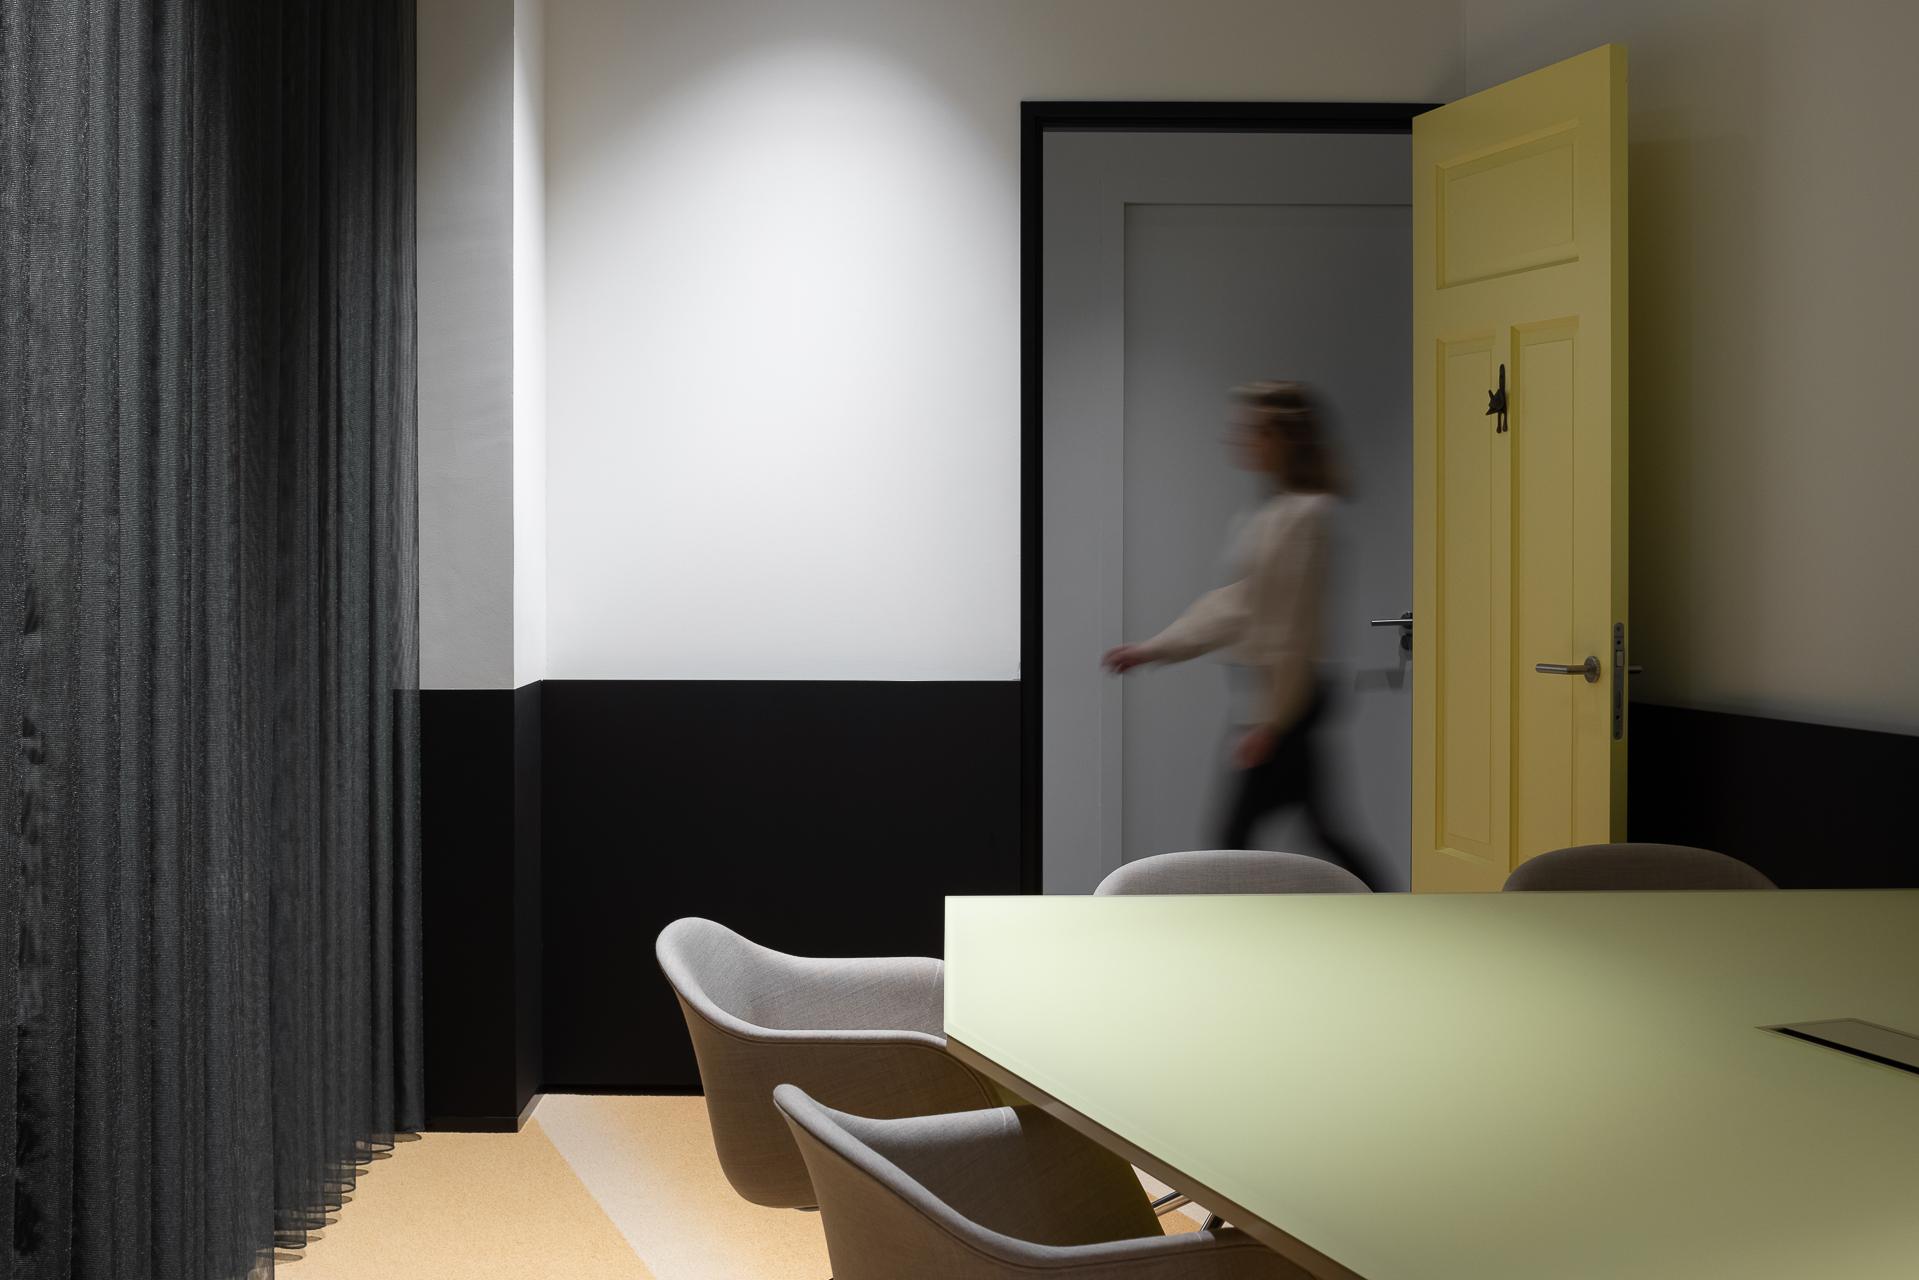 SP2020-Guerrilla-Games-Amsterdam-Office-Interieurfotografie-30